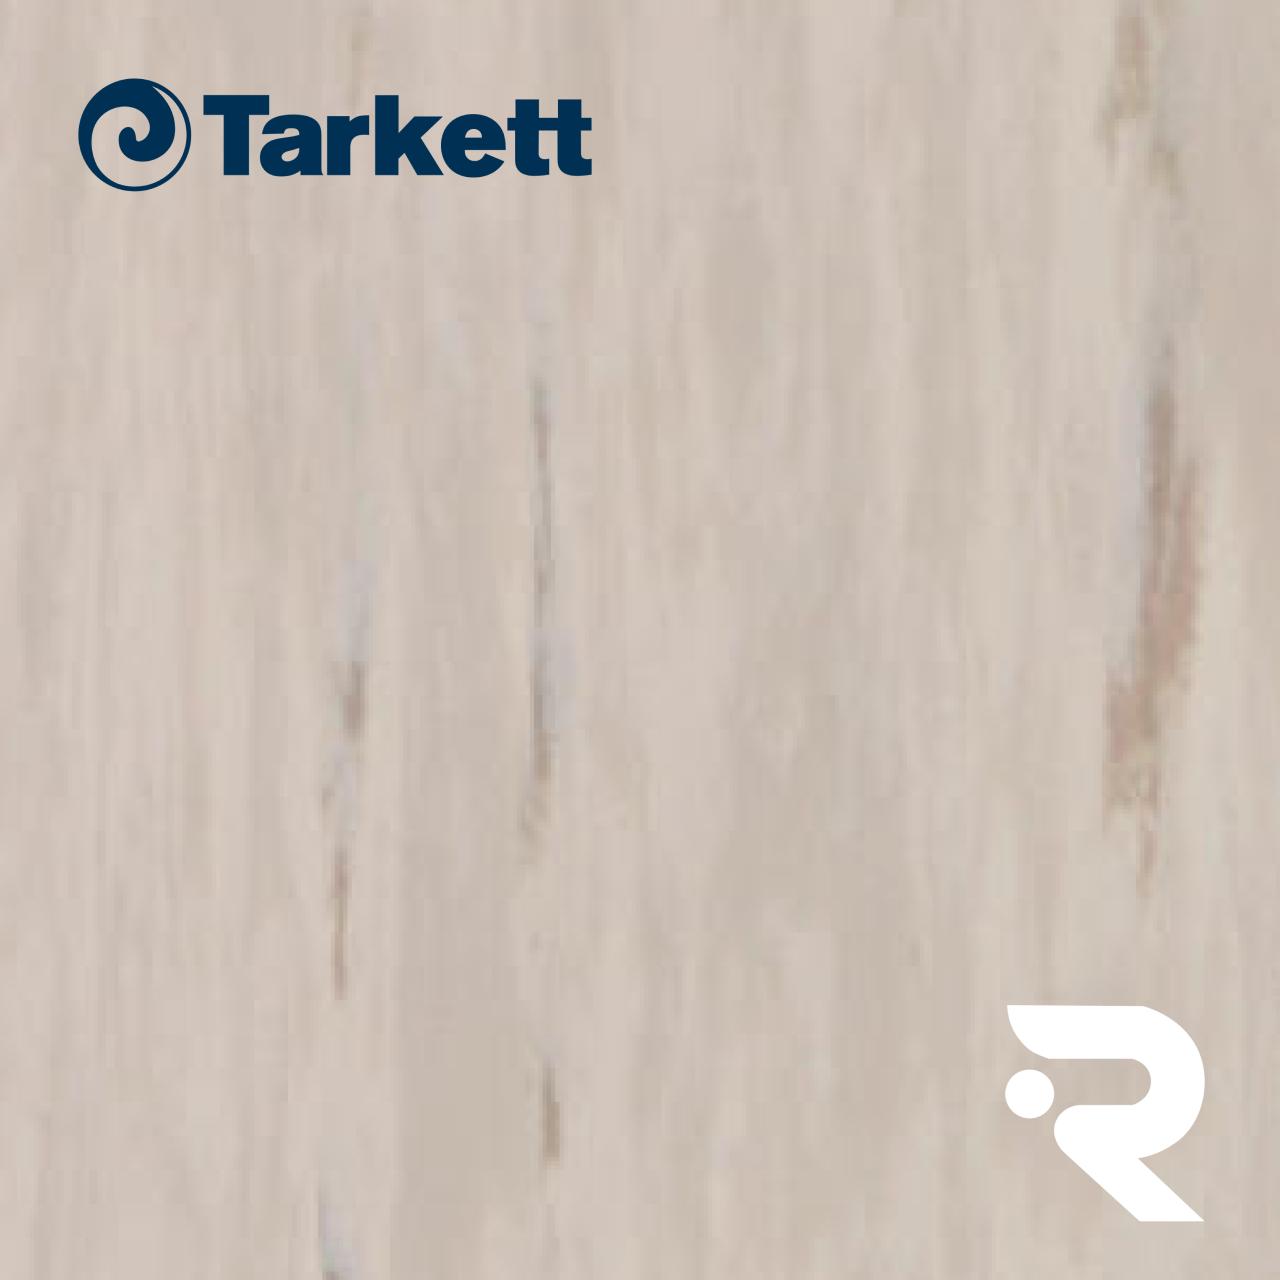 🏫 Гомогенный линолеум Tarkett   Standard LIGHT WARM GREY 0910   Standard Plus 2.0 mm   2 х 23 м